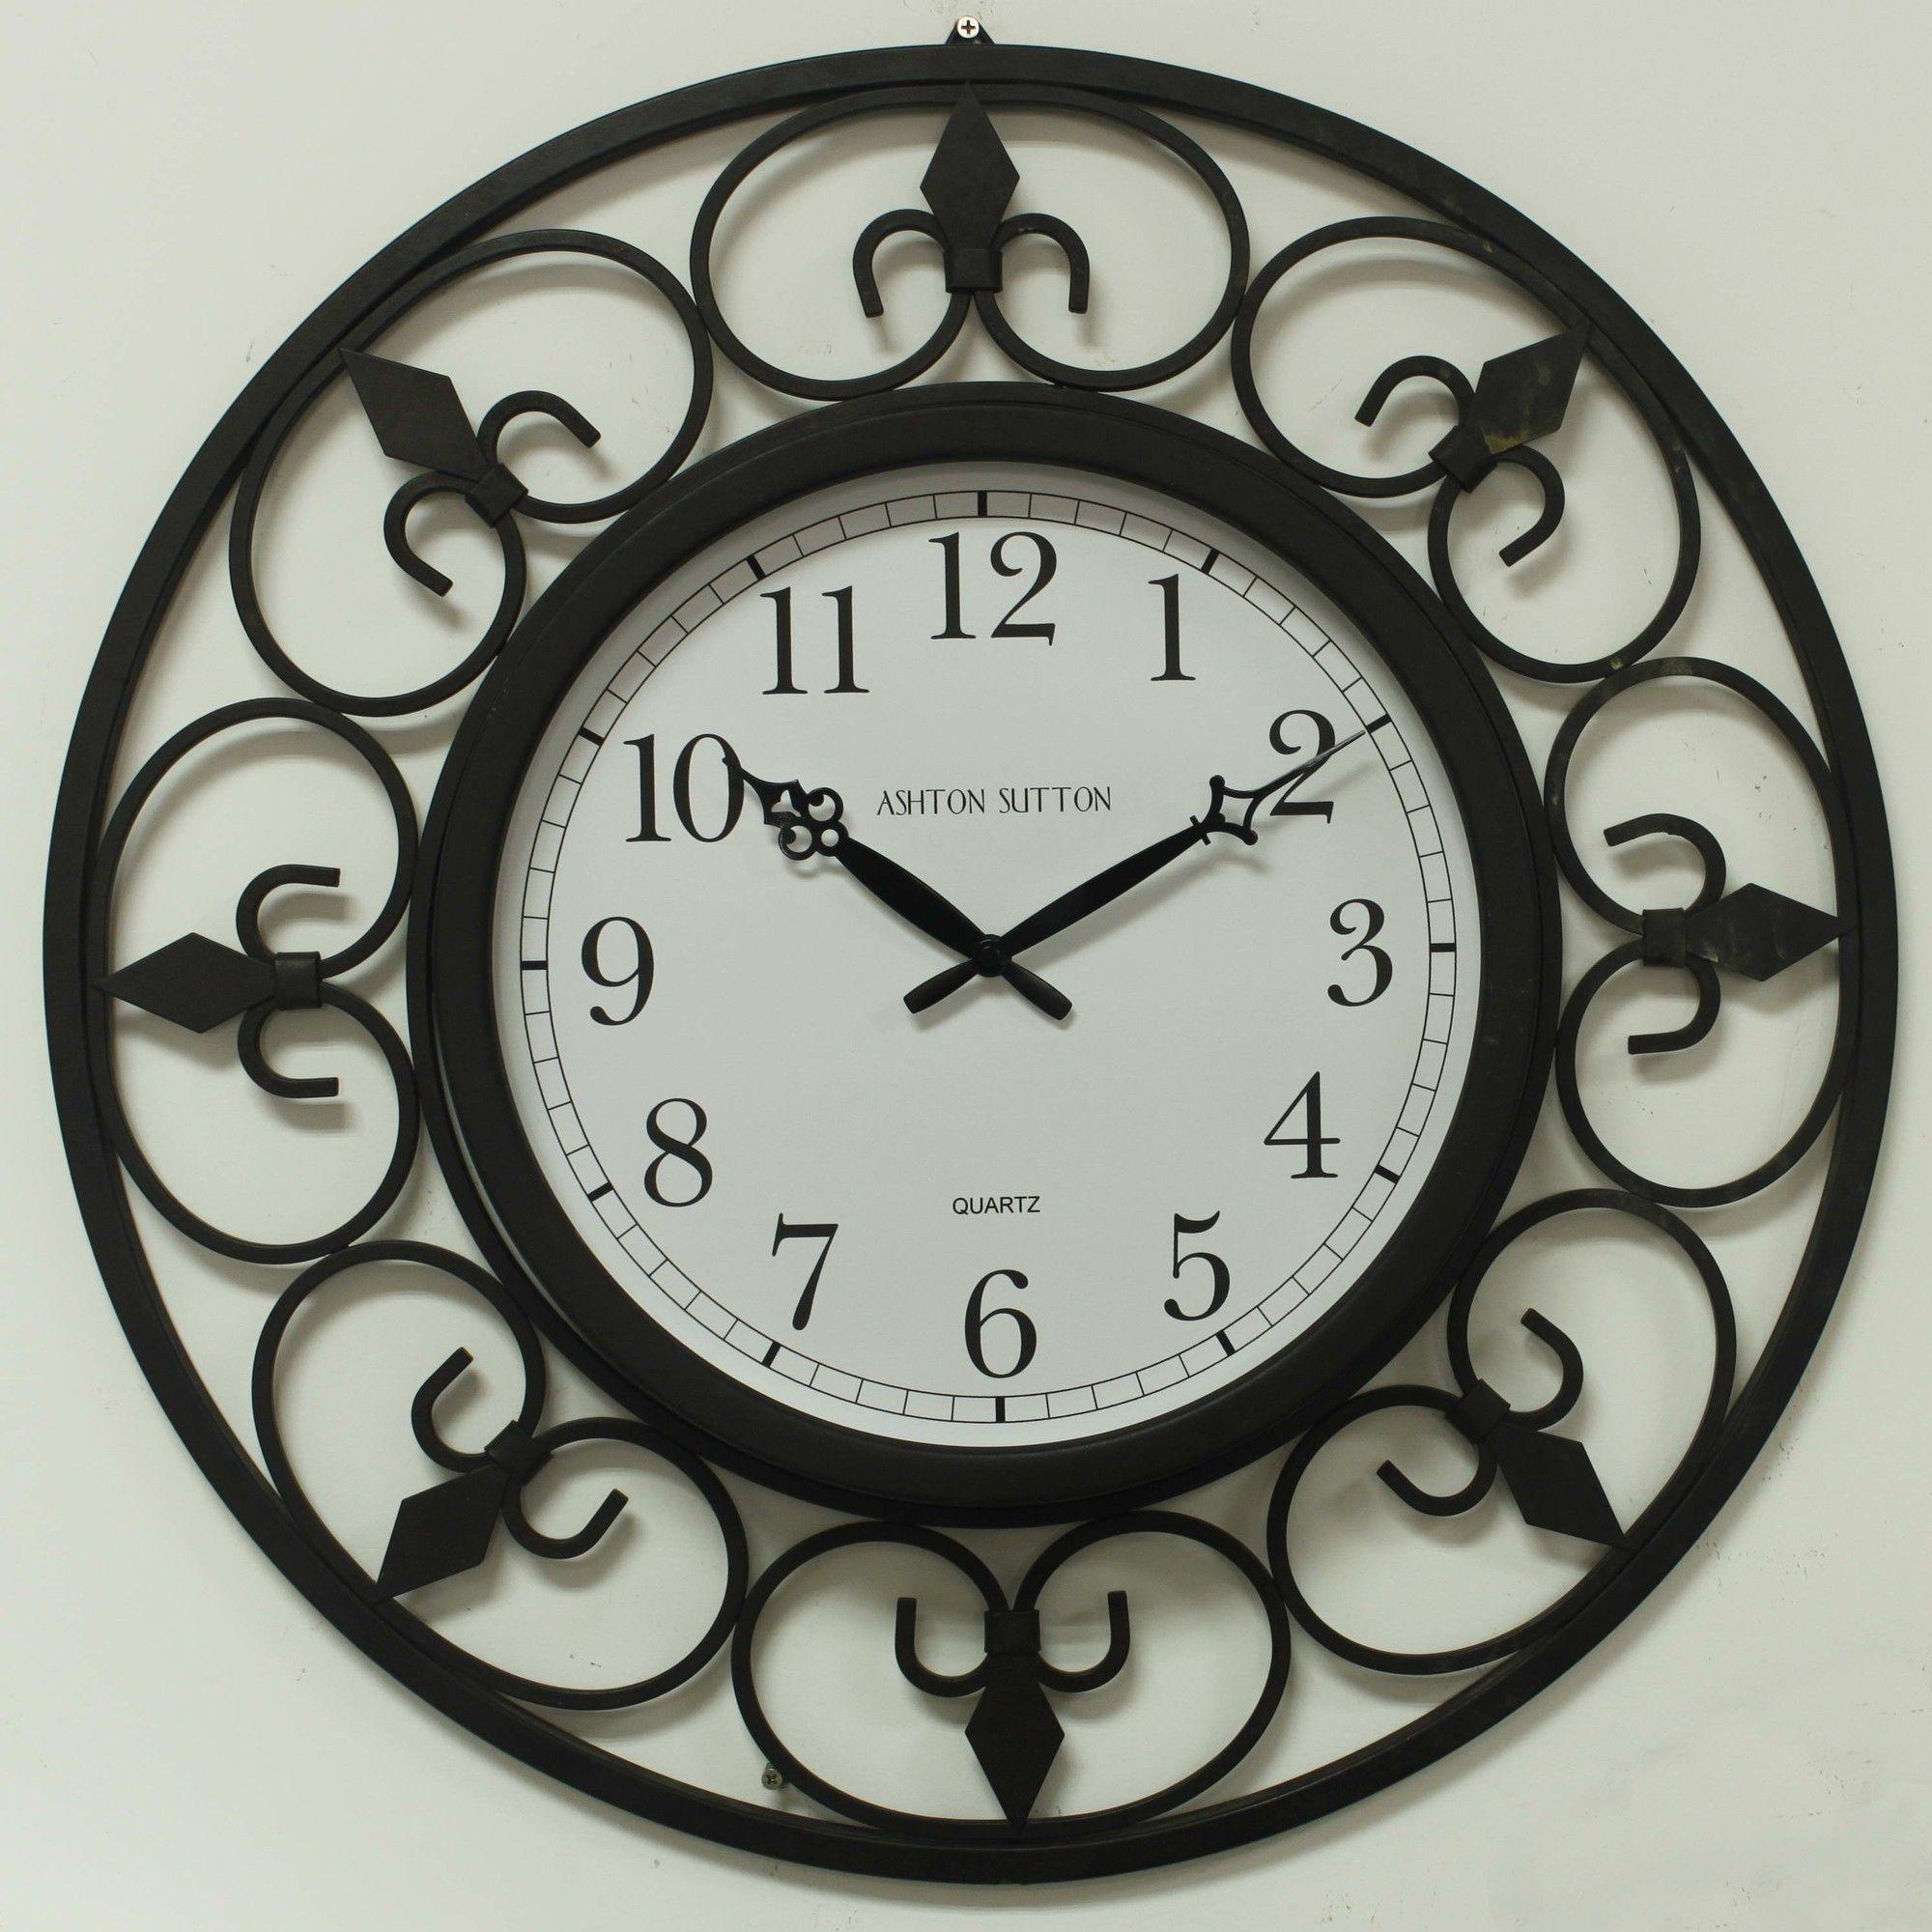 Illuminated Outdoor Wall Clock Google Search Outdoor Clock Wall Clock Light Large Outdoor Clock